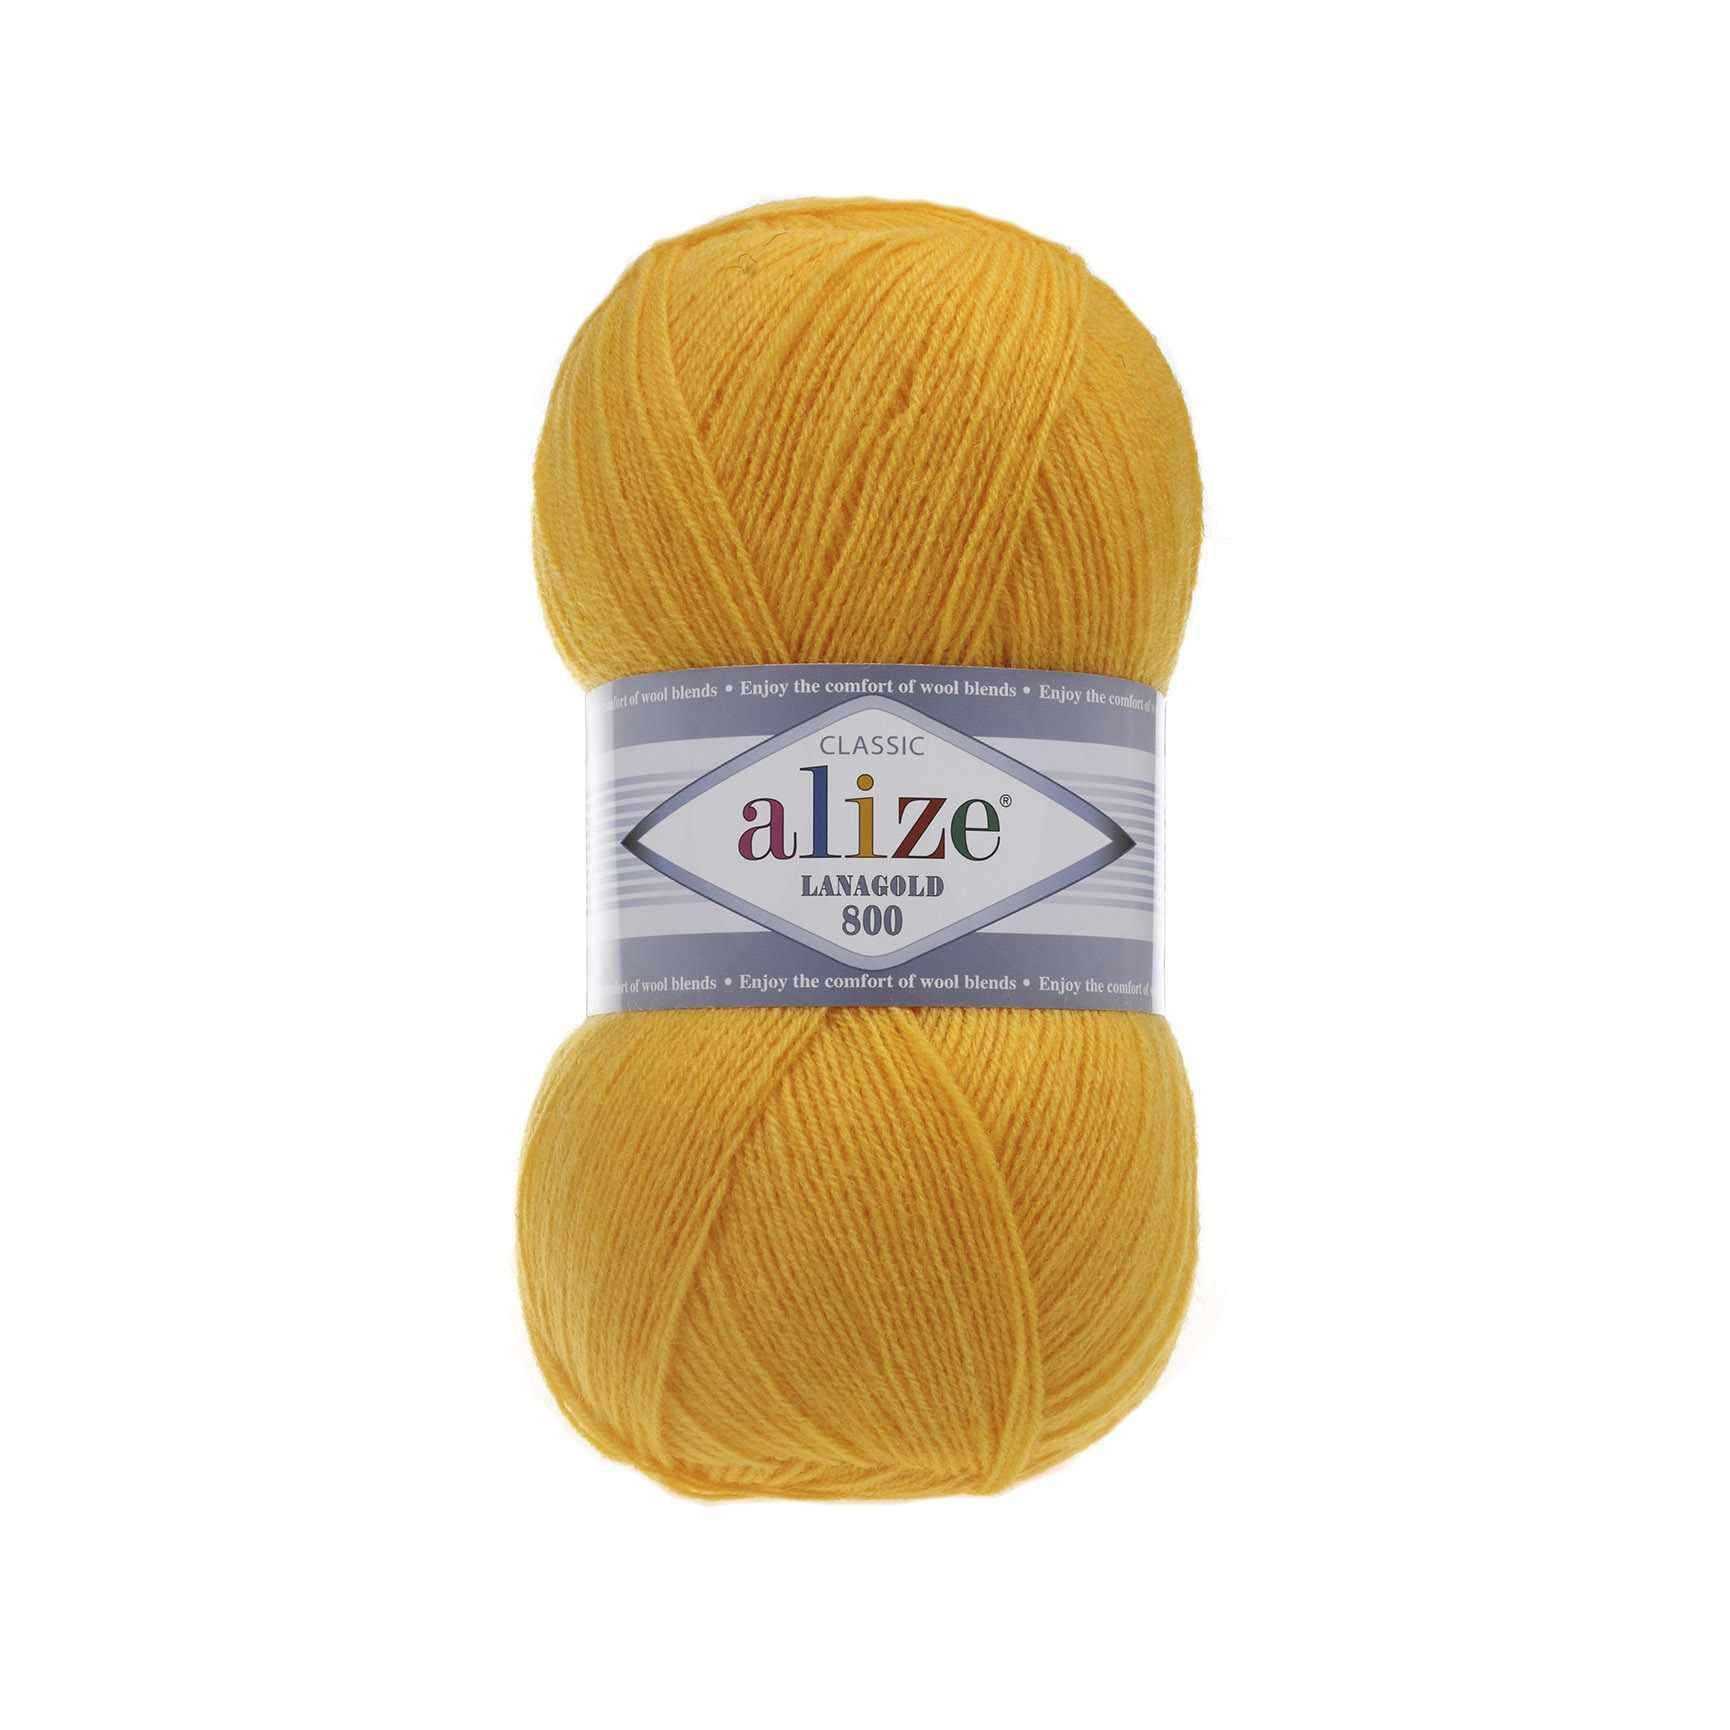 Пряжа Alize Lana Gold 800 Цвет.216 Желтый